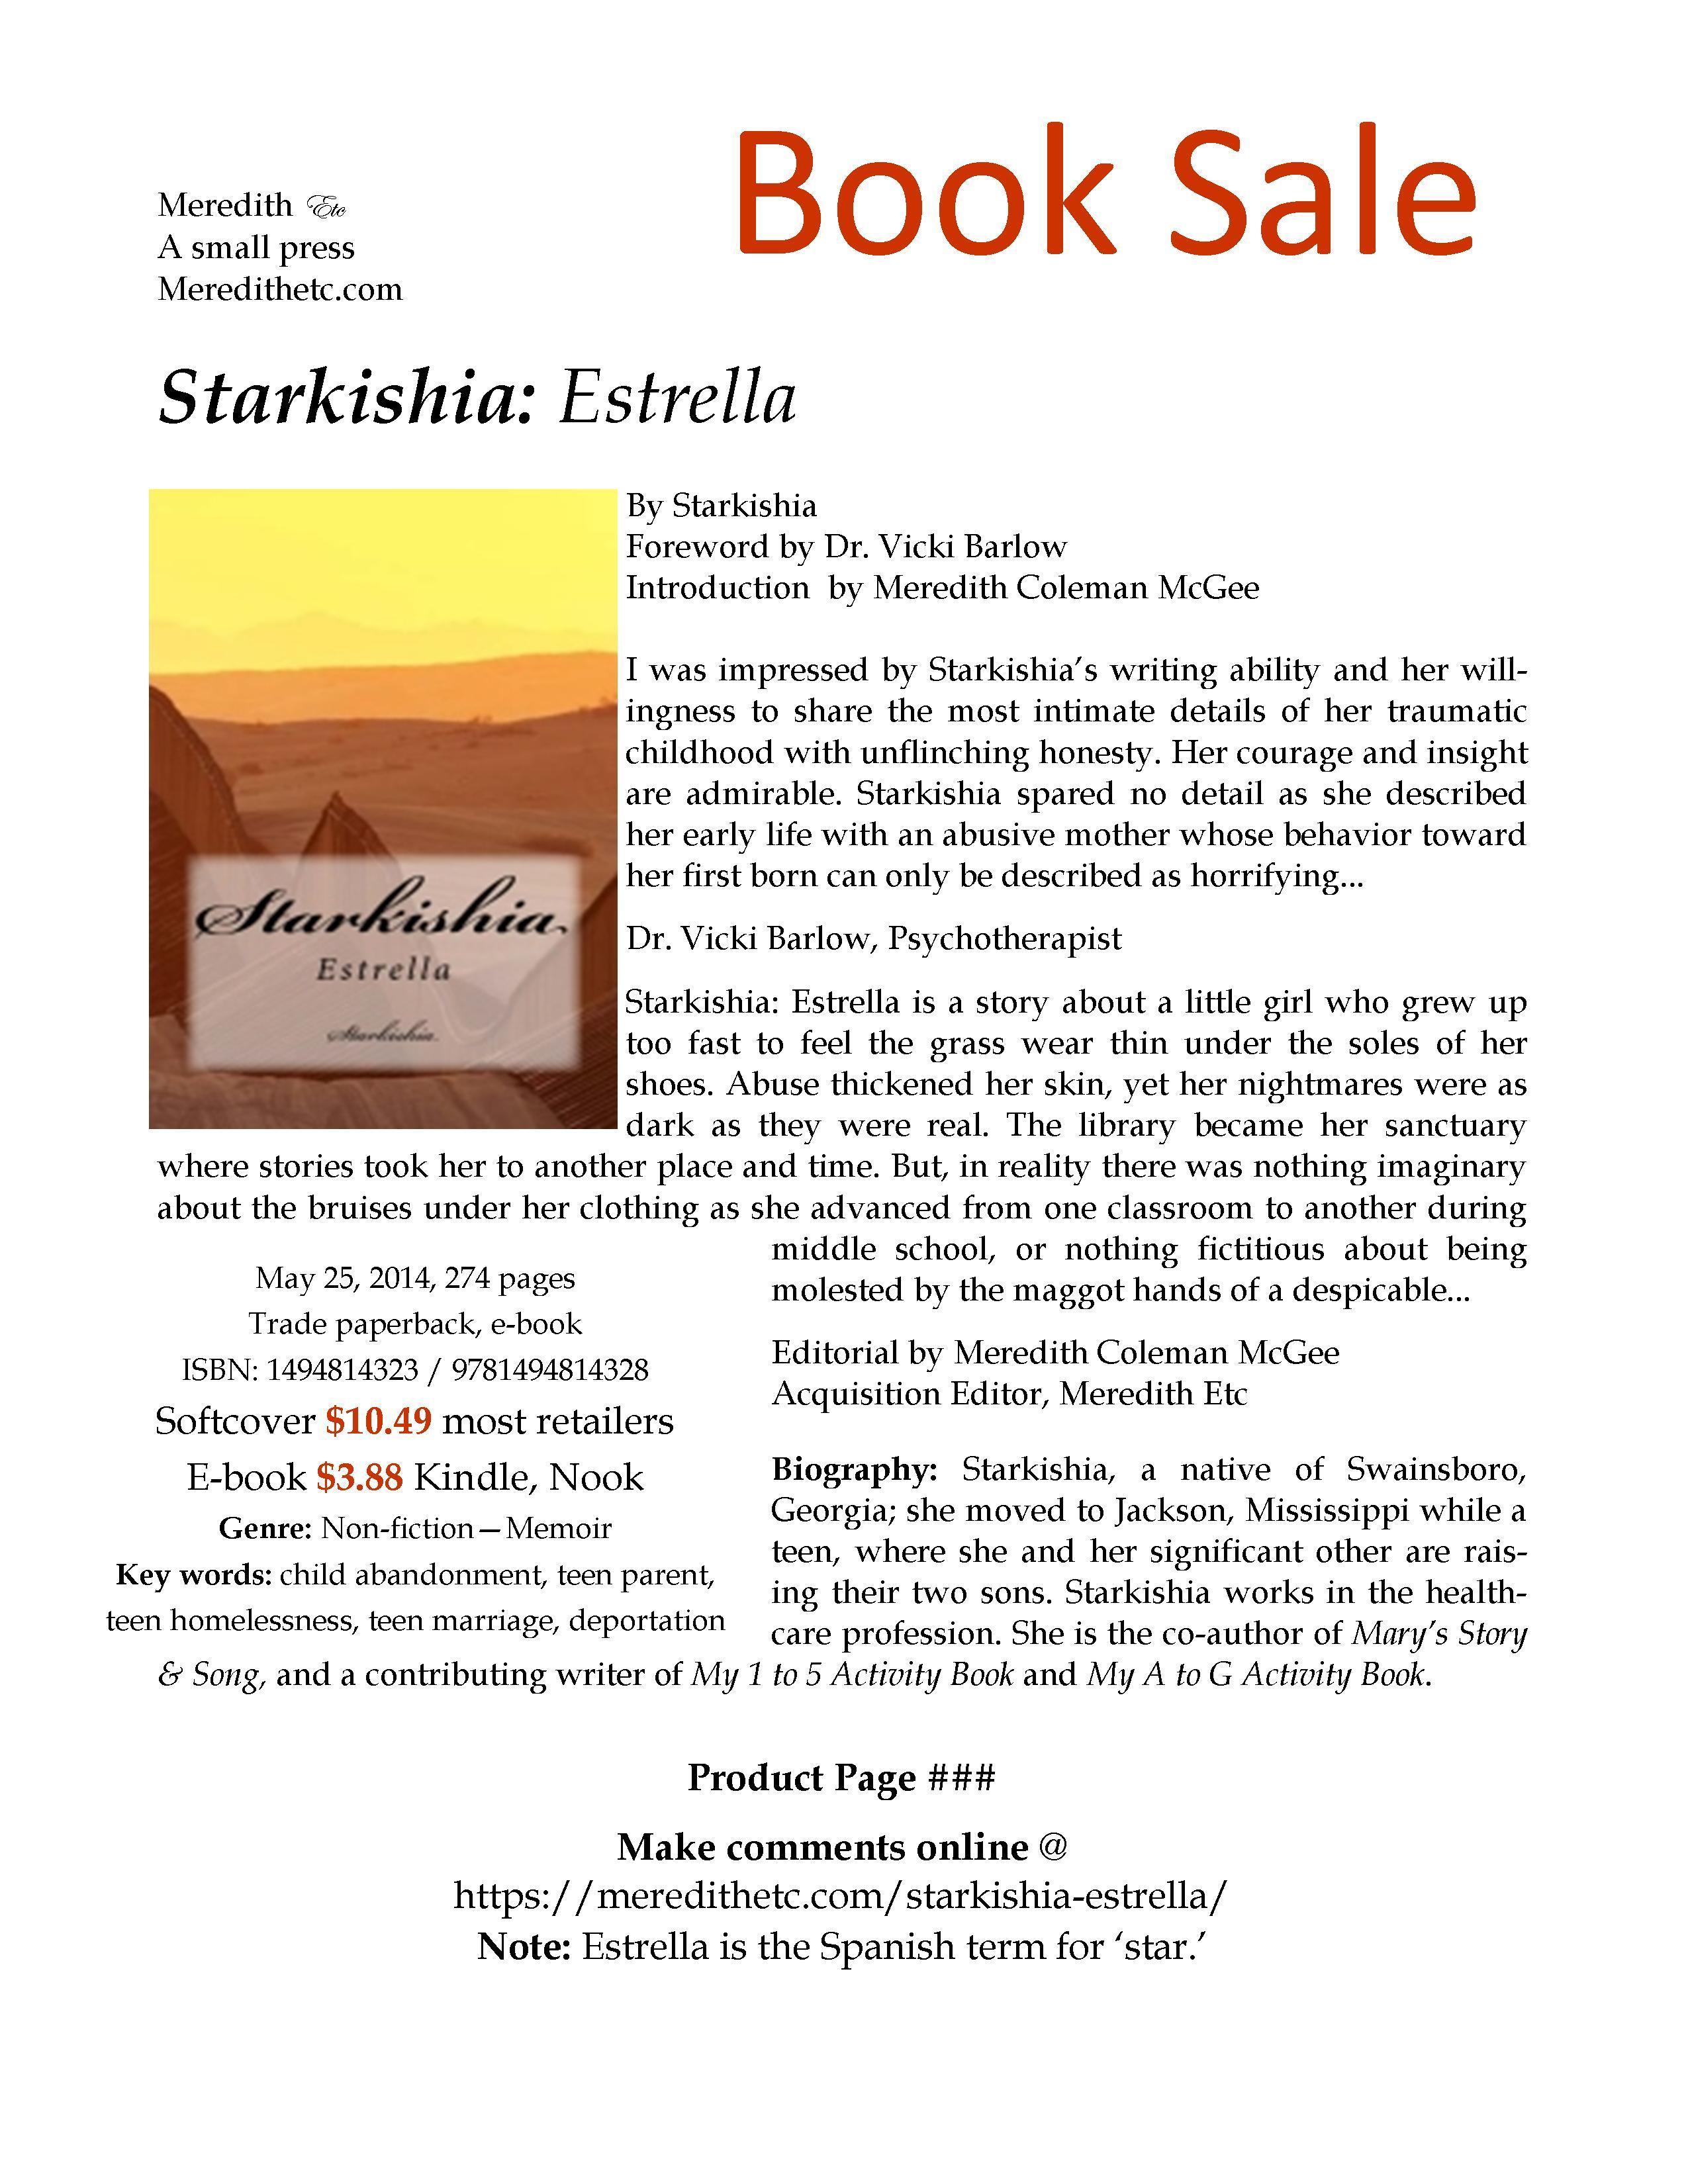 Starkishia: Estrella, a great memoir